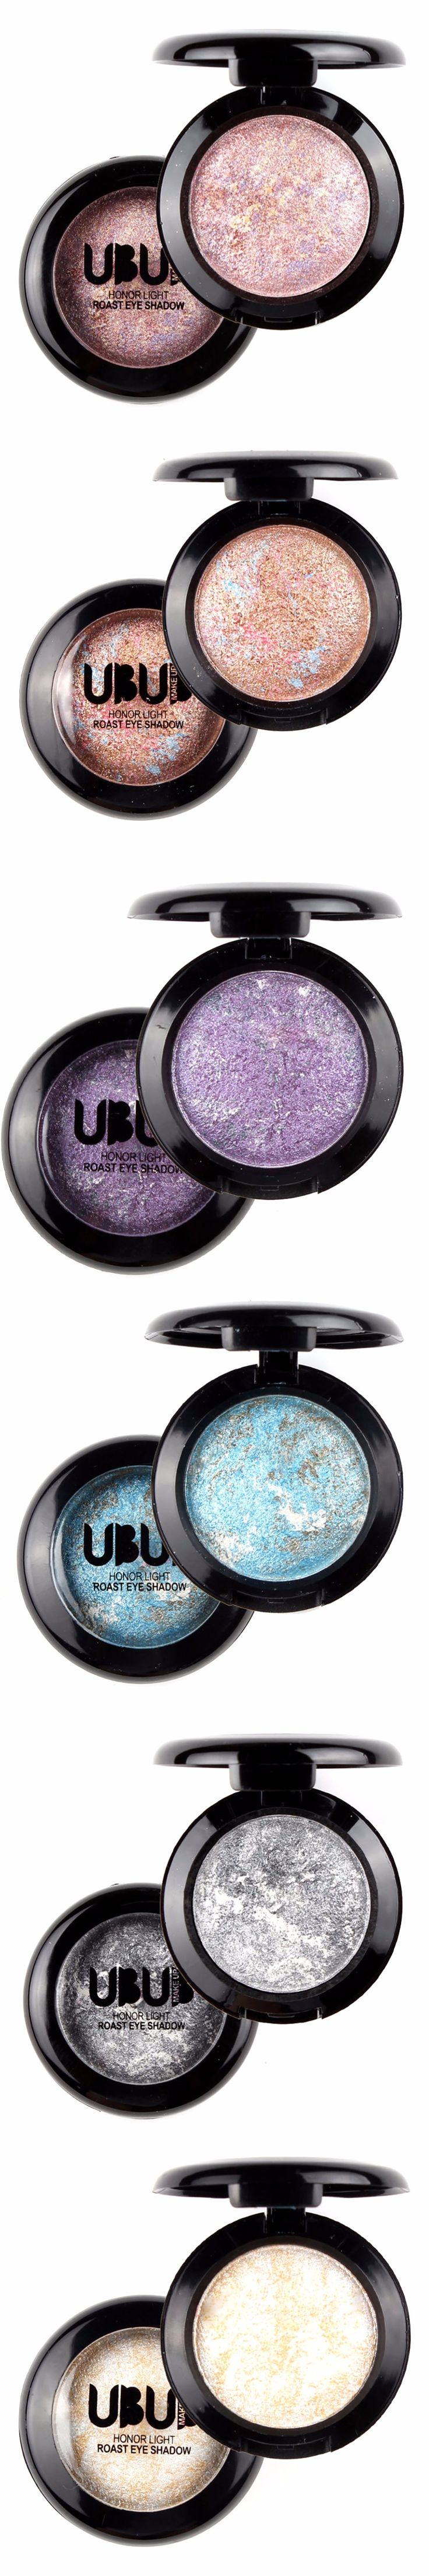 1PCS Single Baked Eye Shadow Powder Palette in Shimmer Metallic Eyeshadow Palette